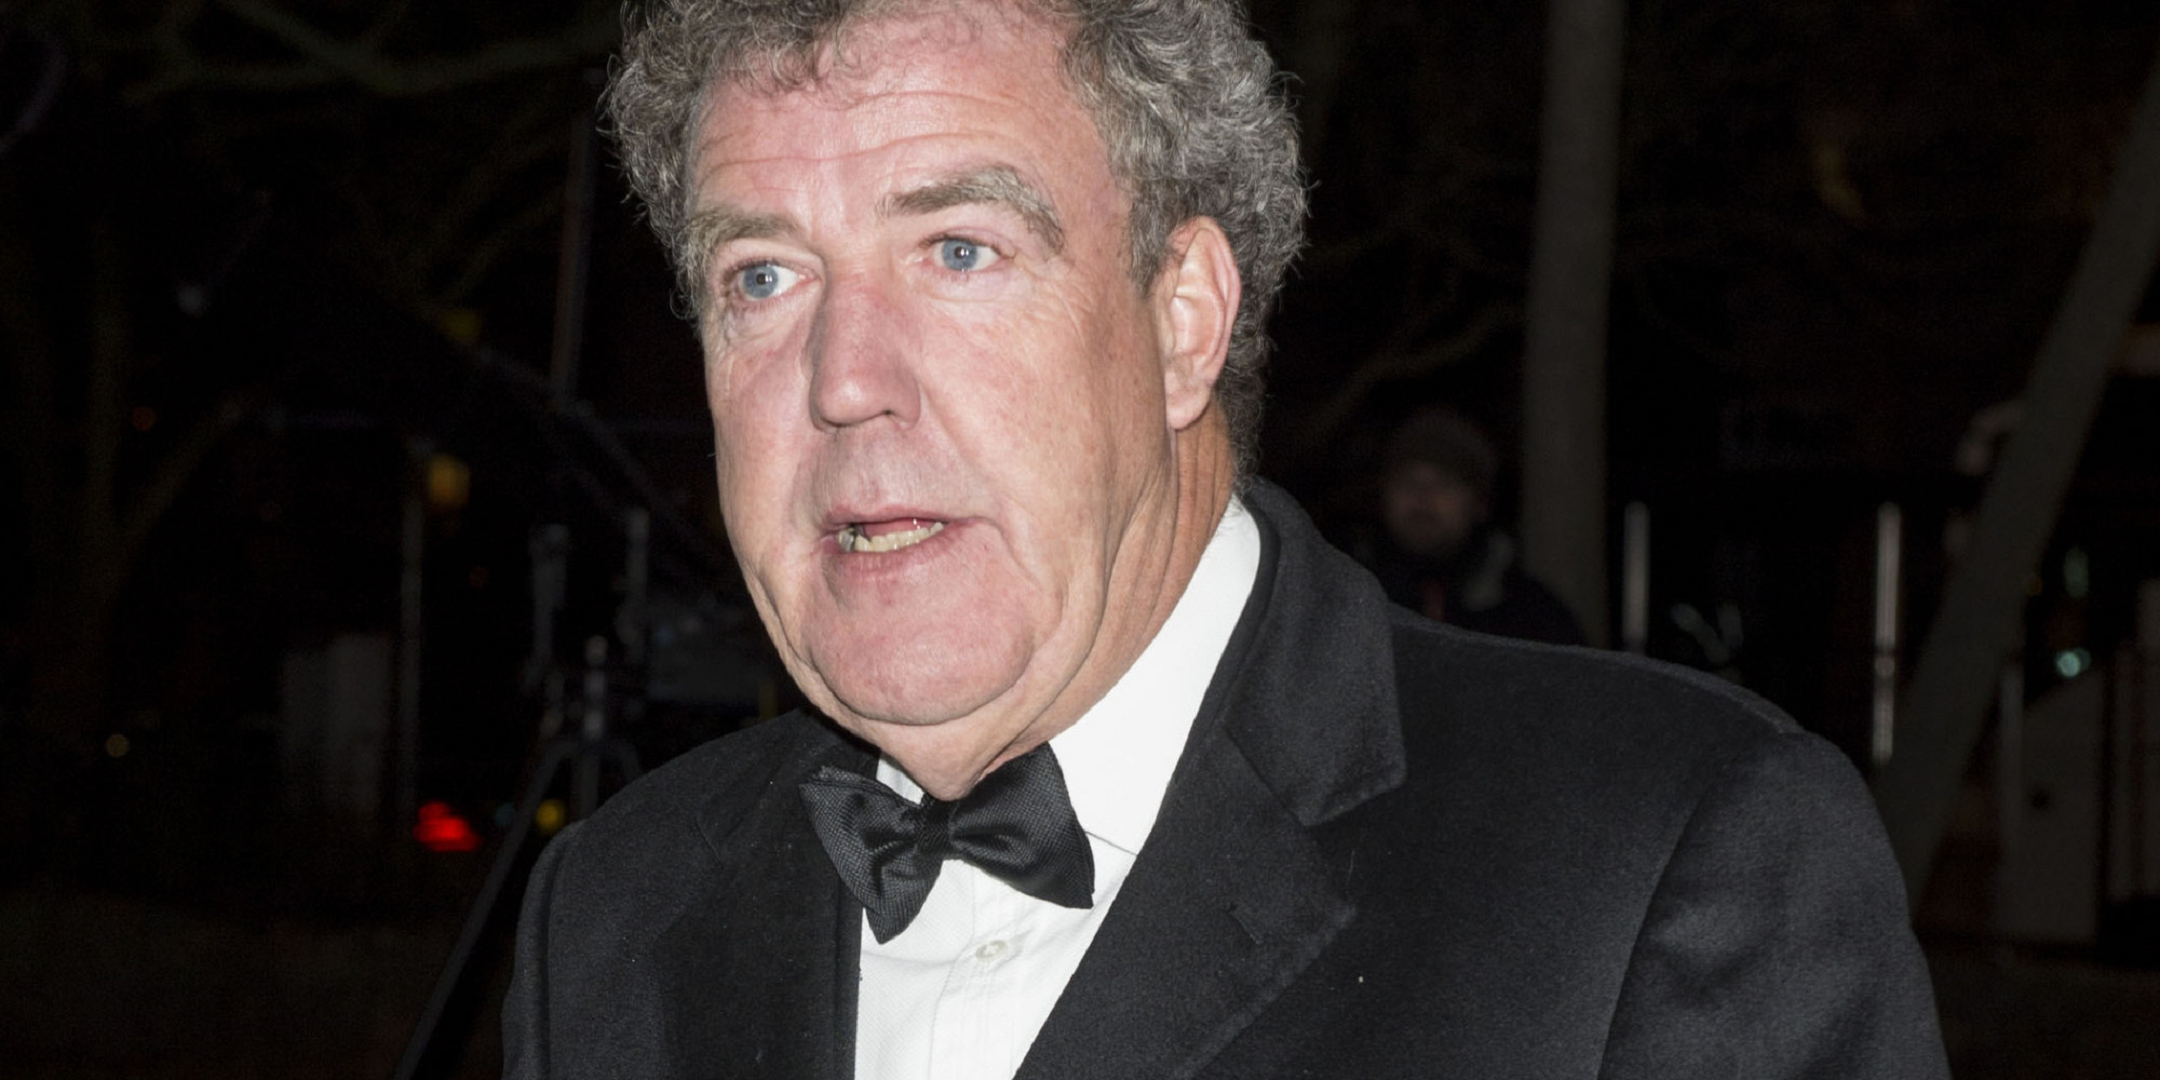 Jeremy Clarkson Computer Backgrounds